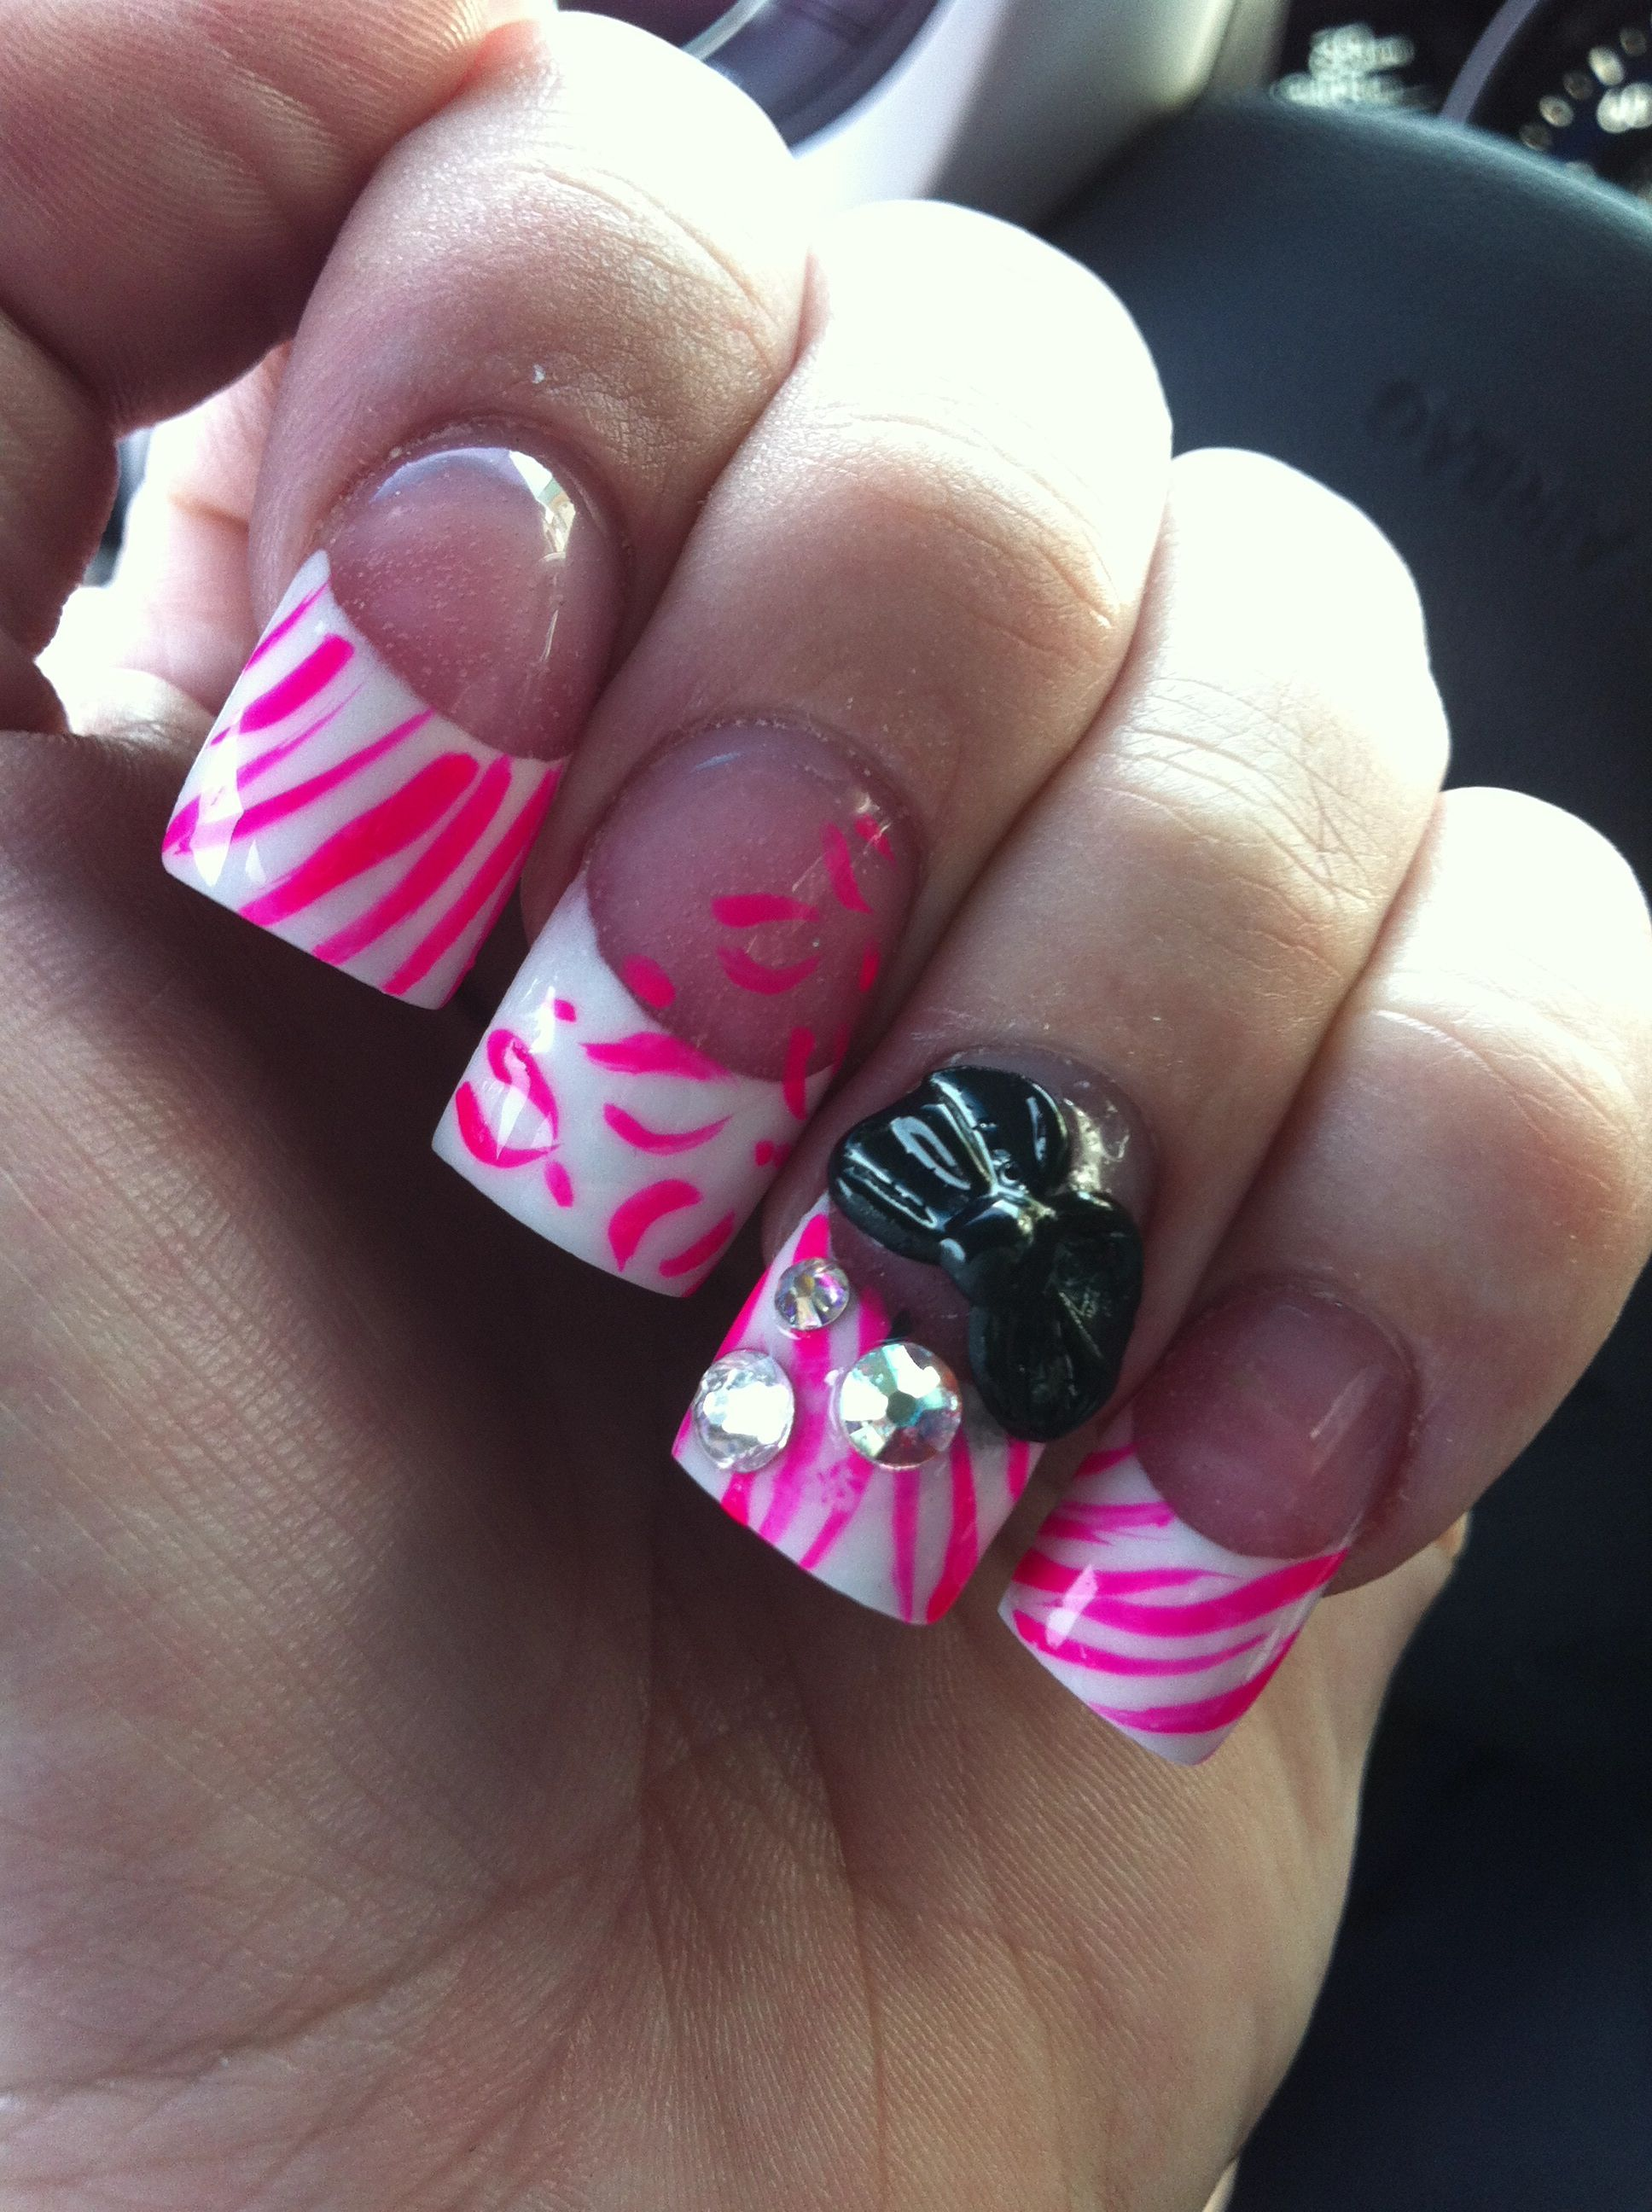 Old Fashioned D Nails Inspiration - Nail Art Ideas - morihati.com